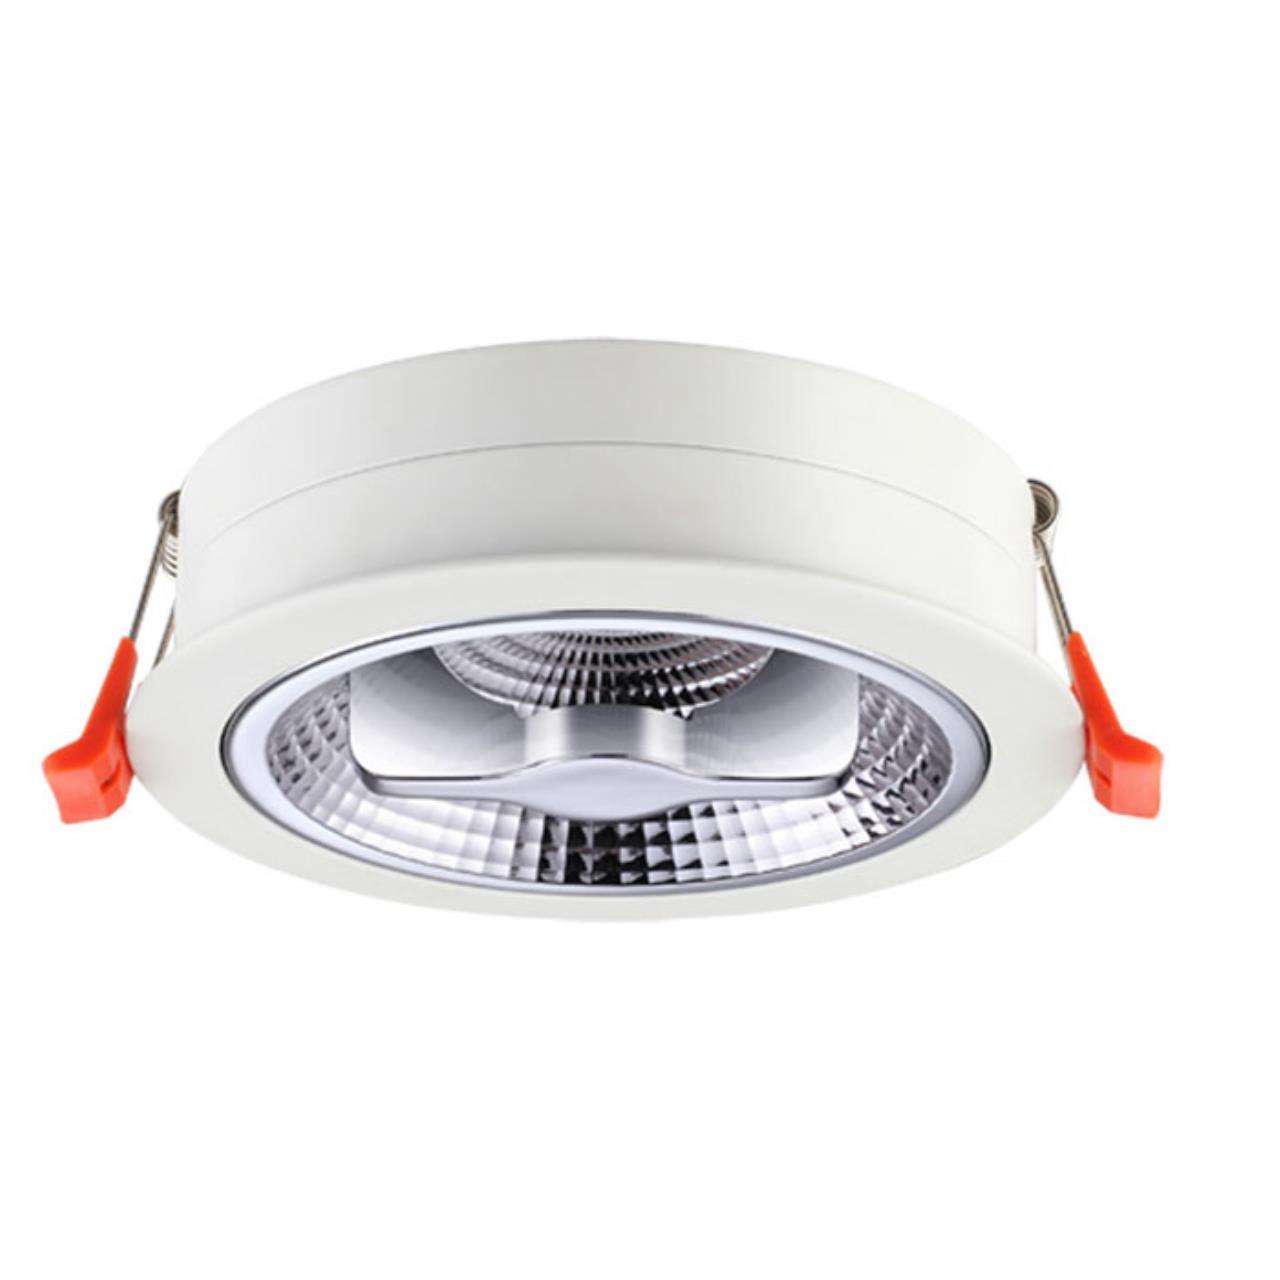 357568 SPOT NT18 095 белый Ввстраиваемый светильник IP20 LED 3000K 15W 220-240V SNAIL